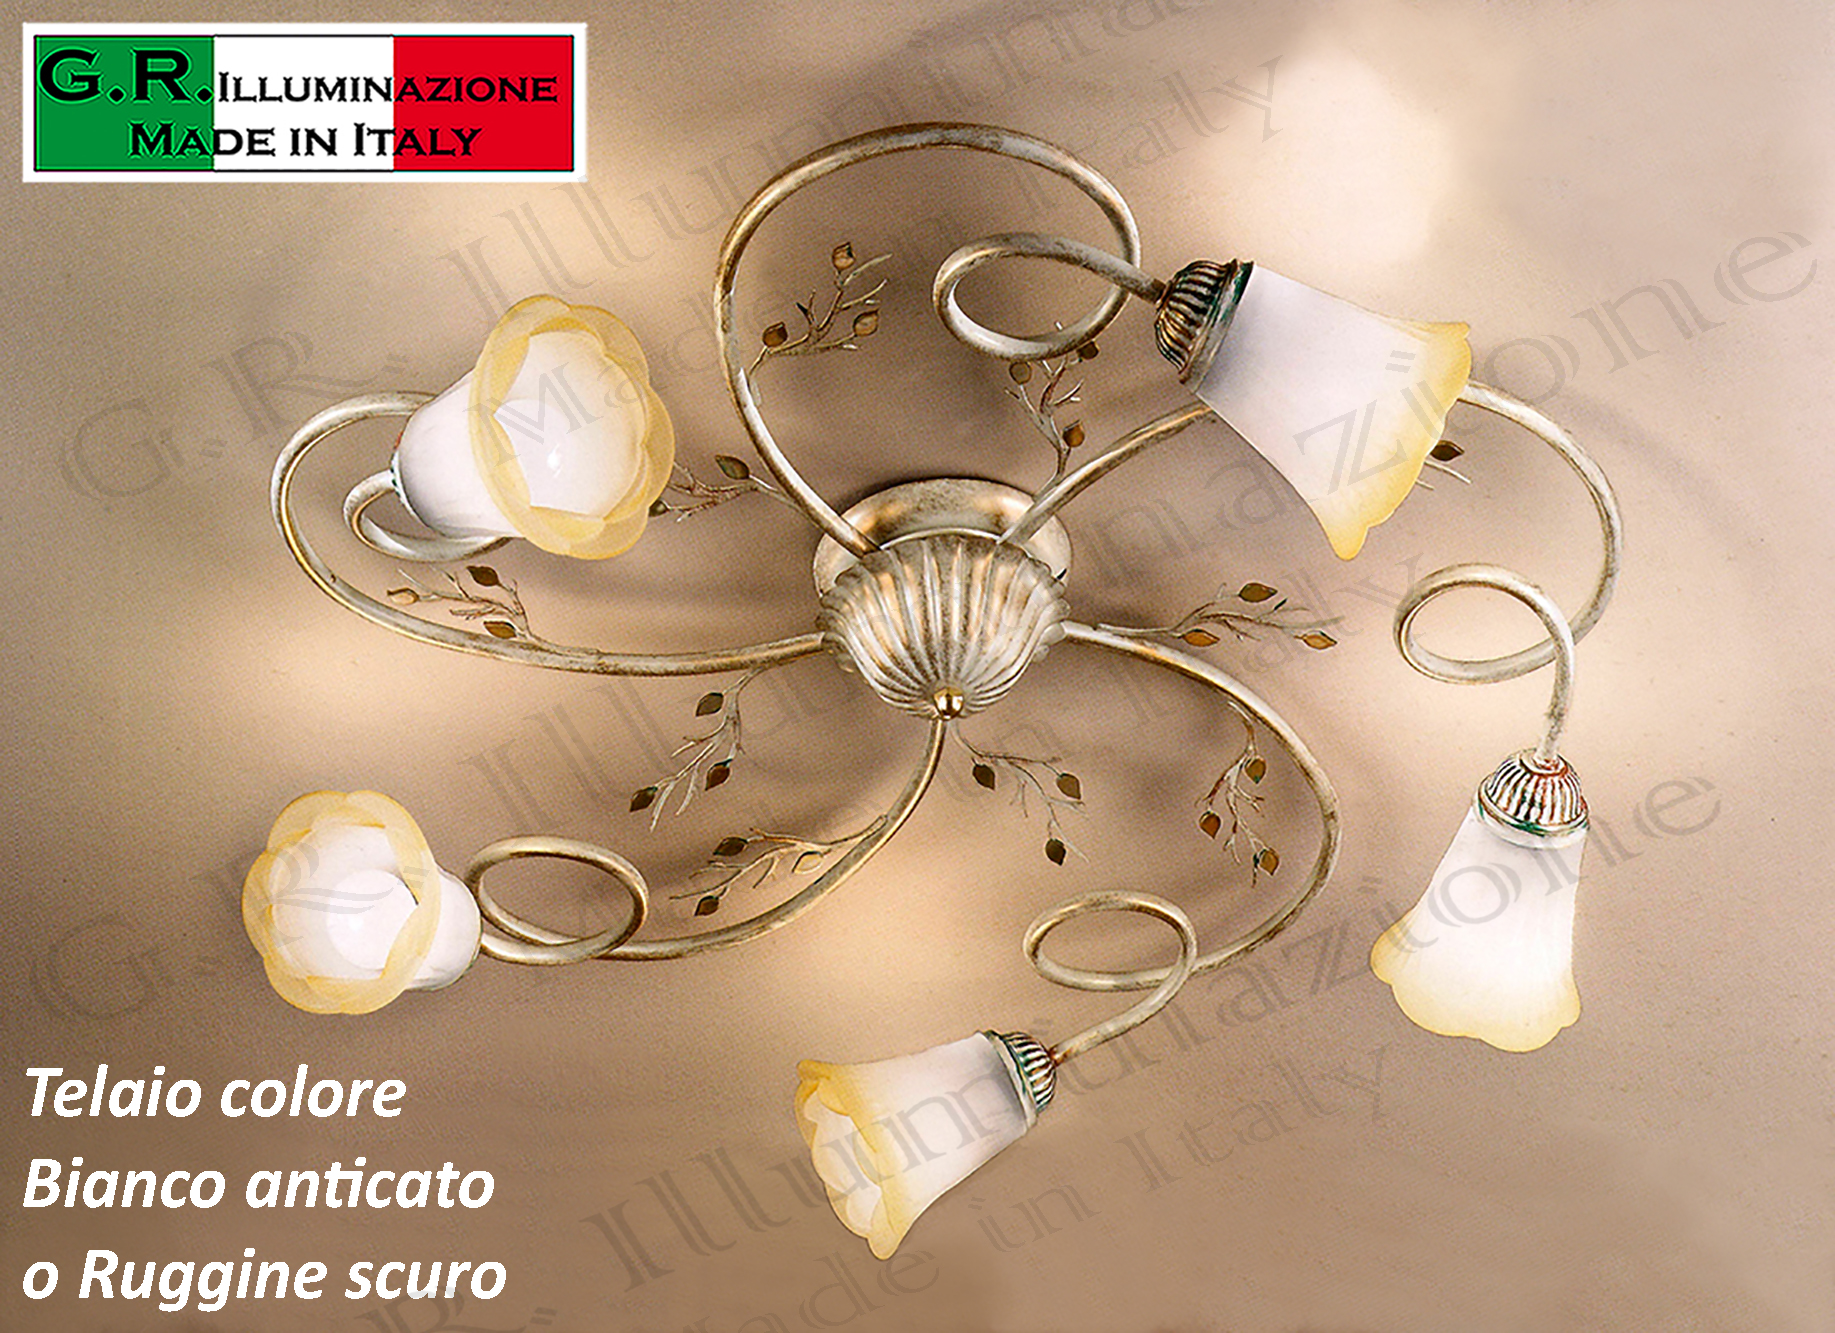 Lampadario Plafoniera Rustico Ferro Battuto : Lampadario plafoniera in ferro battuto luci bianca o